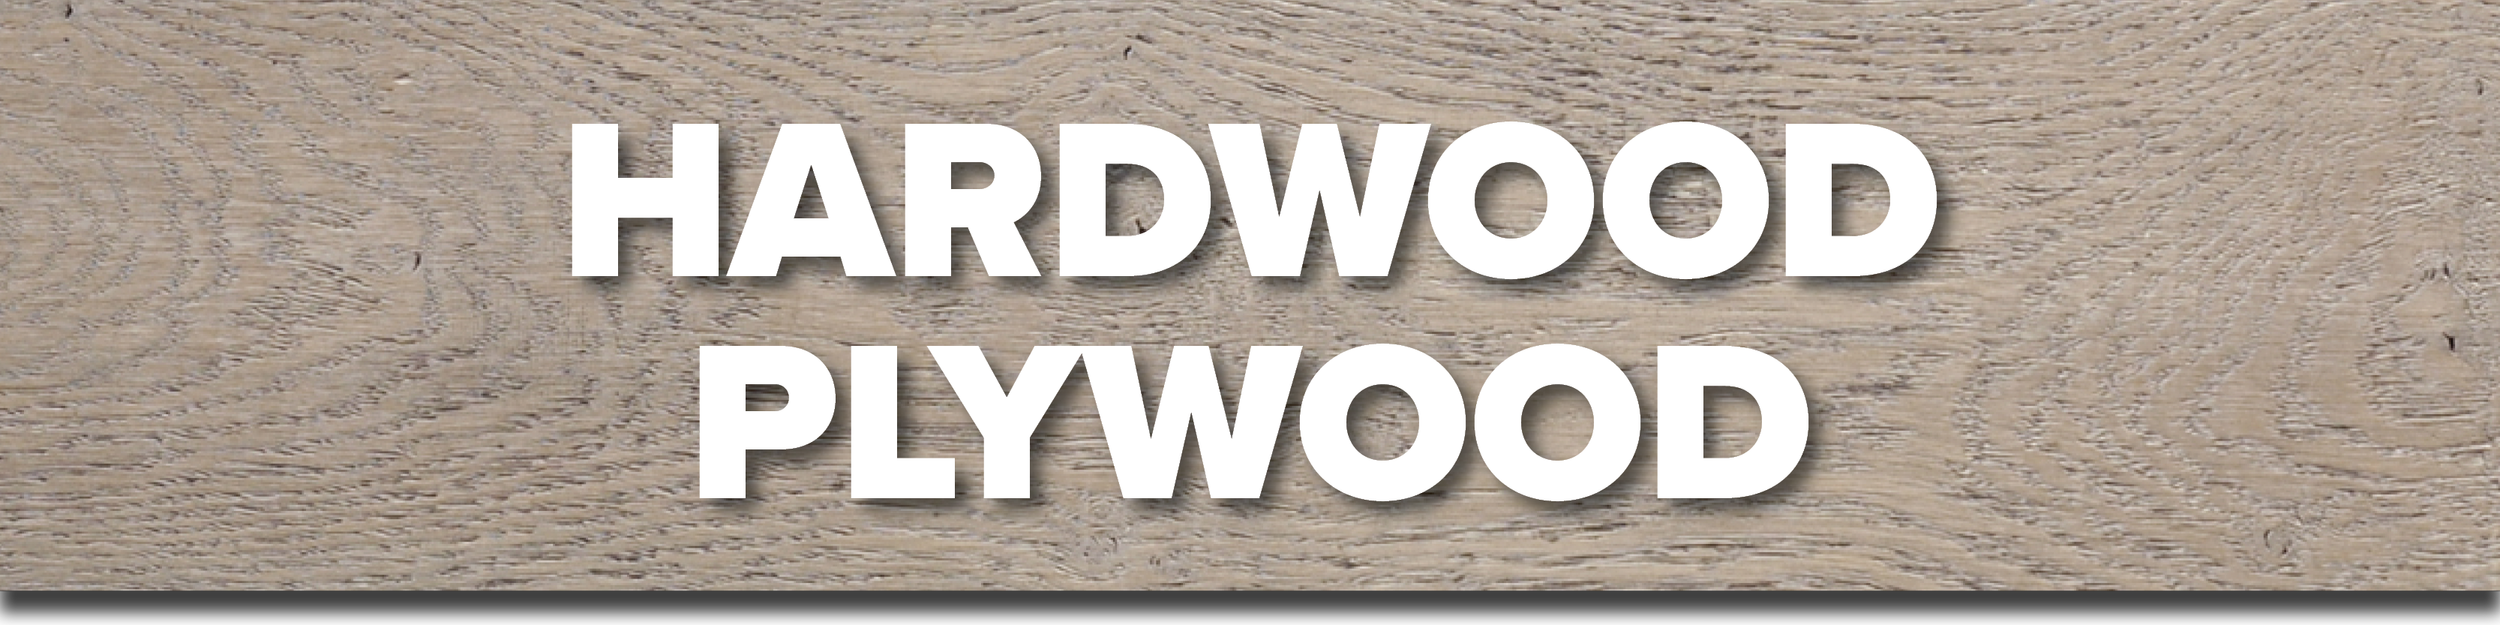 Hardwood Plywood.png